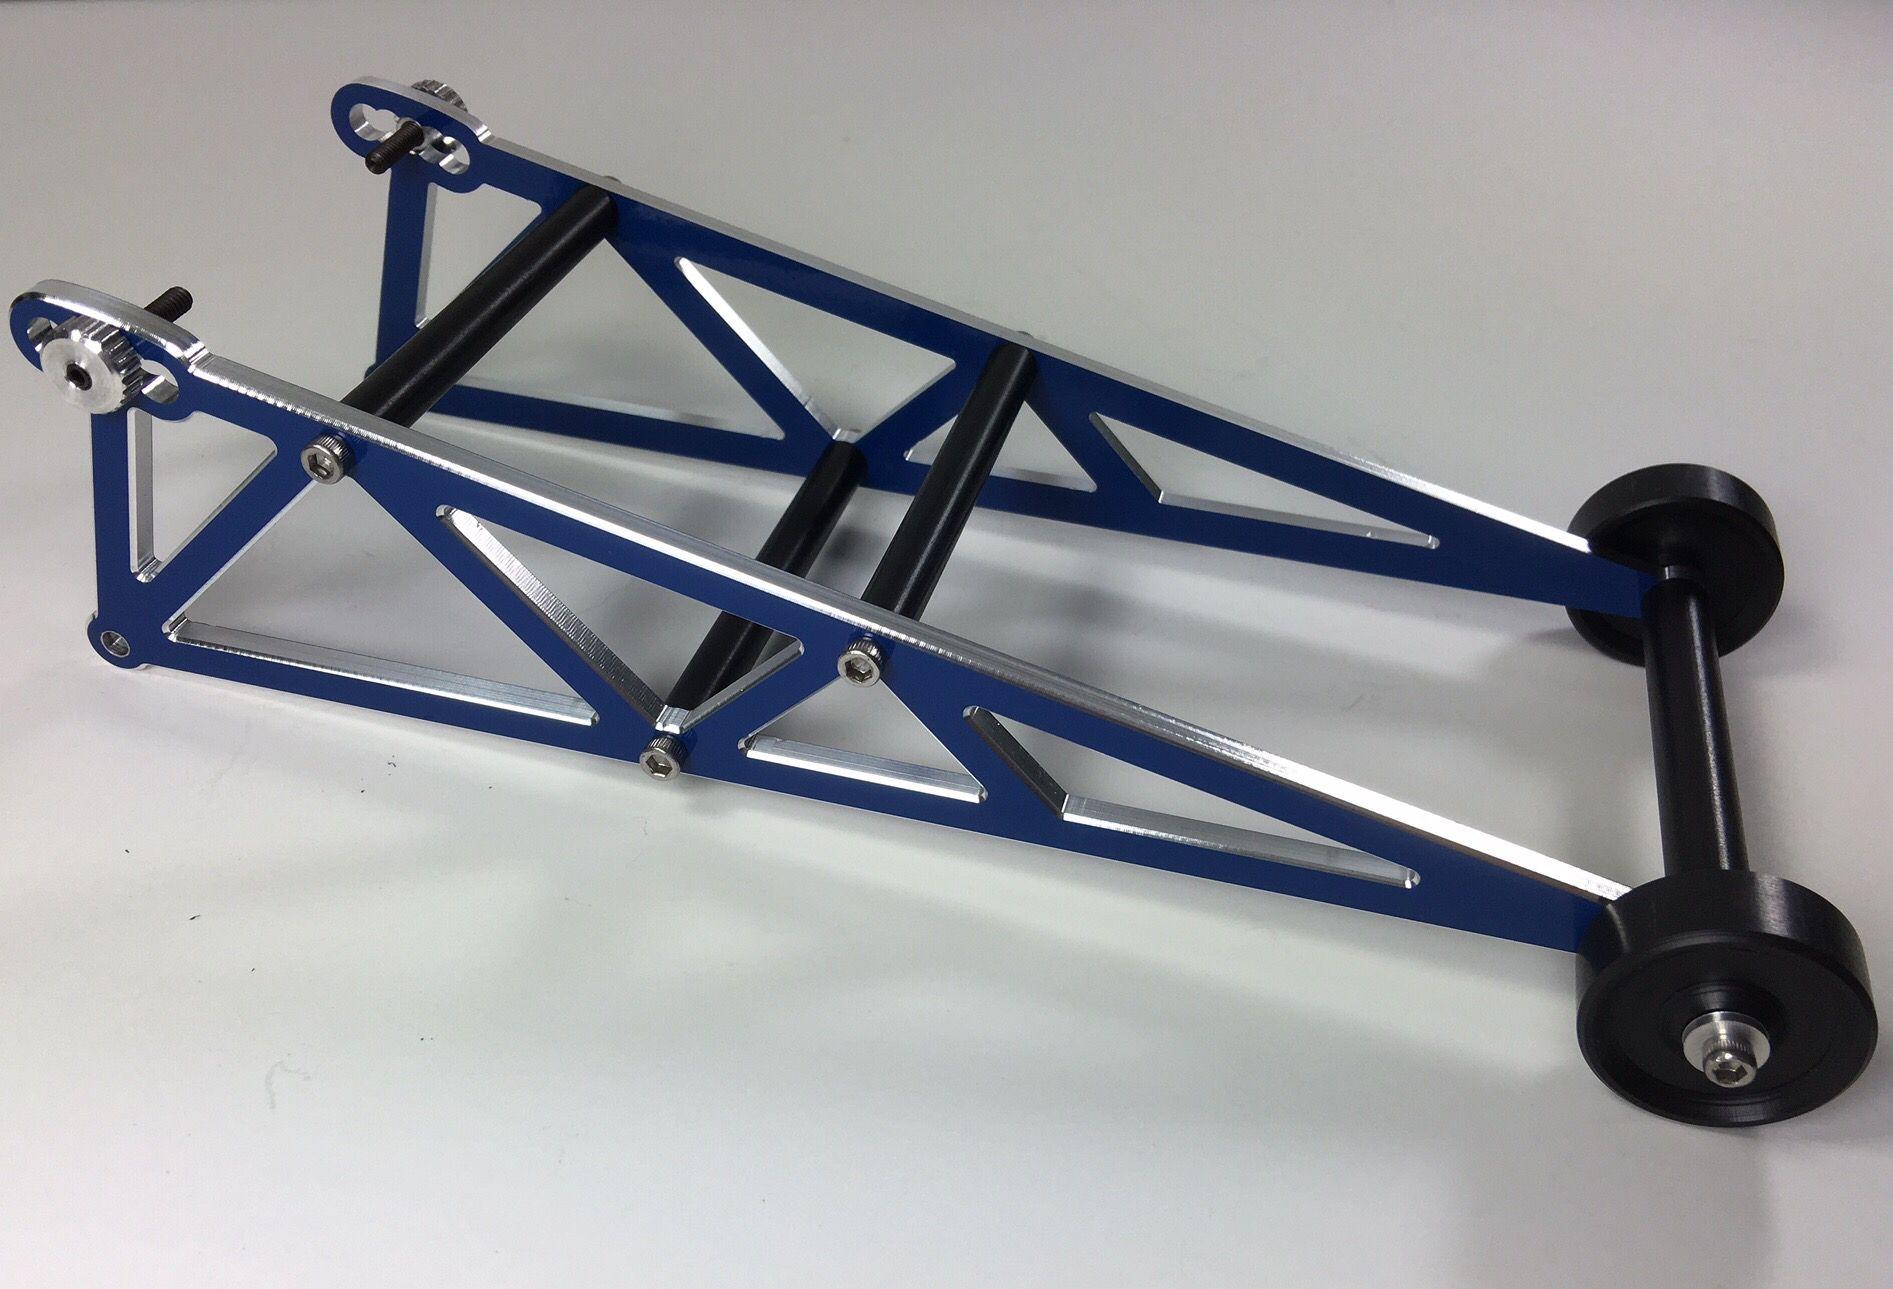 "New Traxxas 7"" long 5 position adjustable Wheelie Bar Now Available"